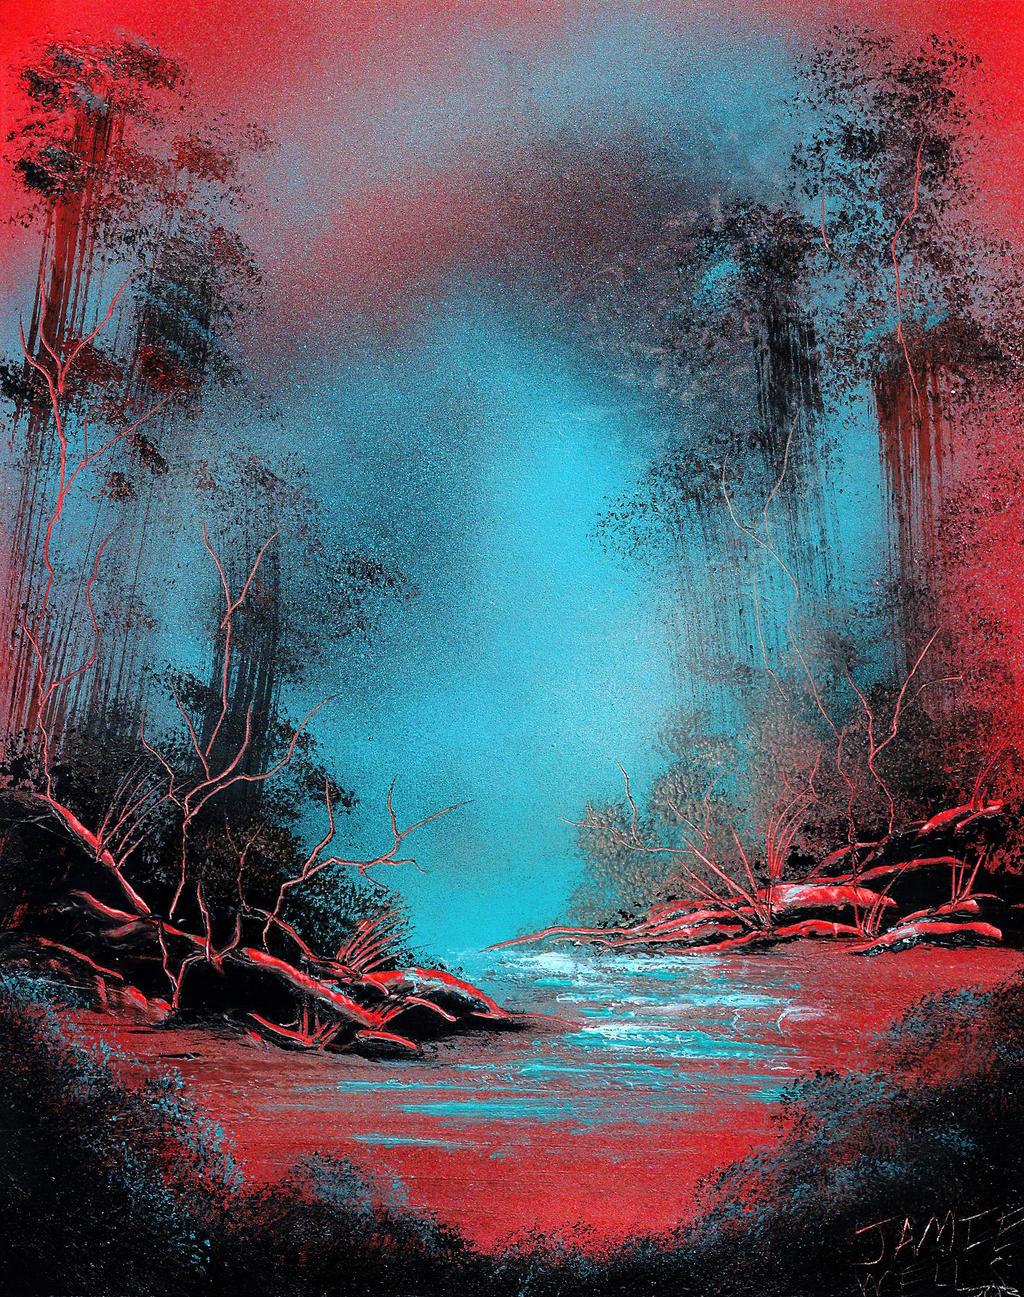 Spray Paint Art This Is A Strange Planet By Visualjamie On Deviantart